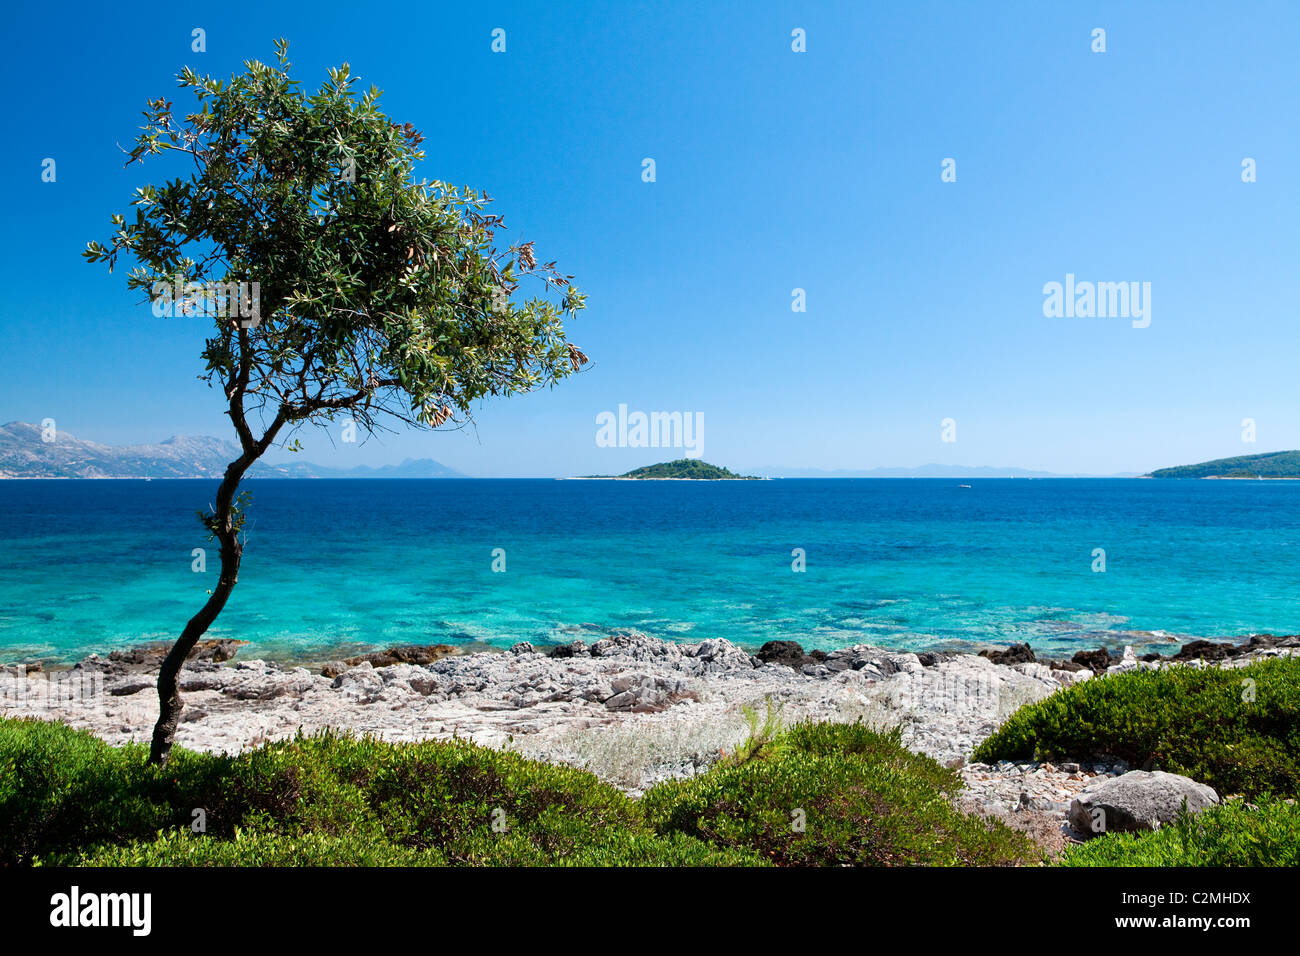 L'isola di Badija in Korkula (Croazia). Immagini Stock